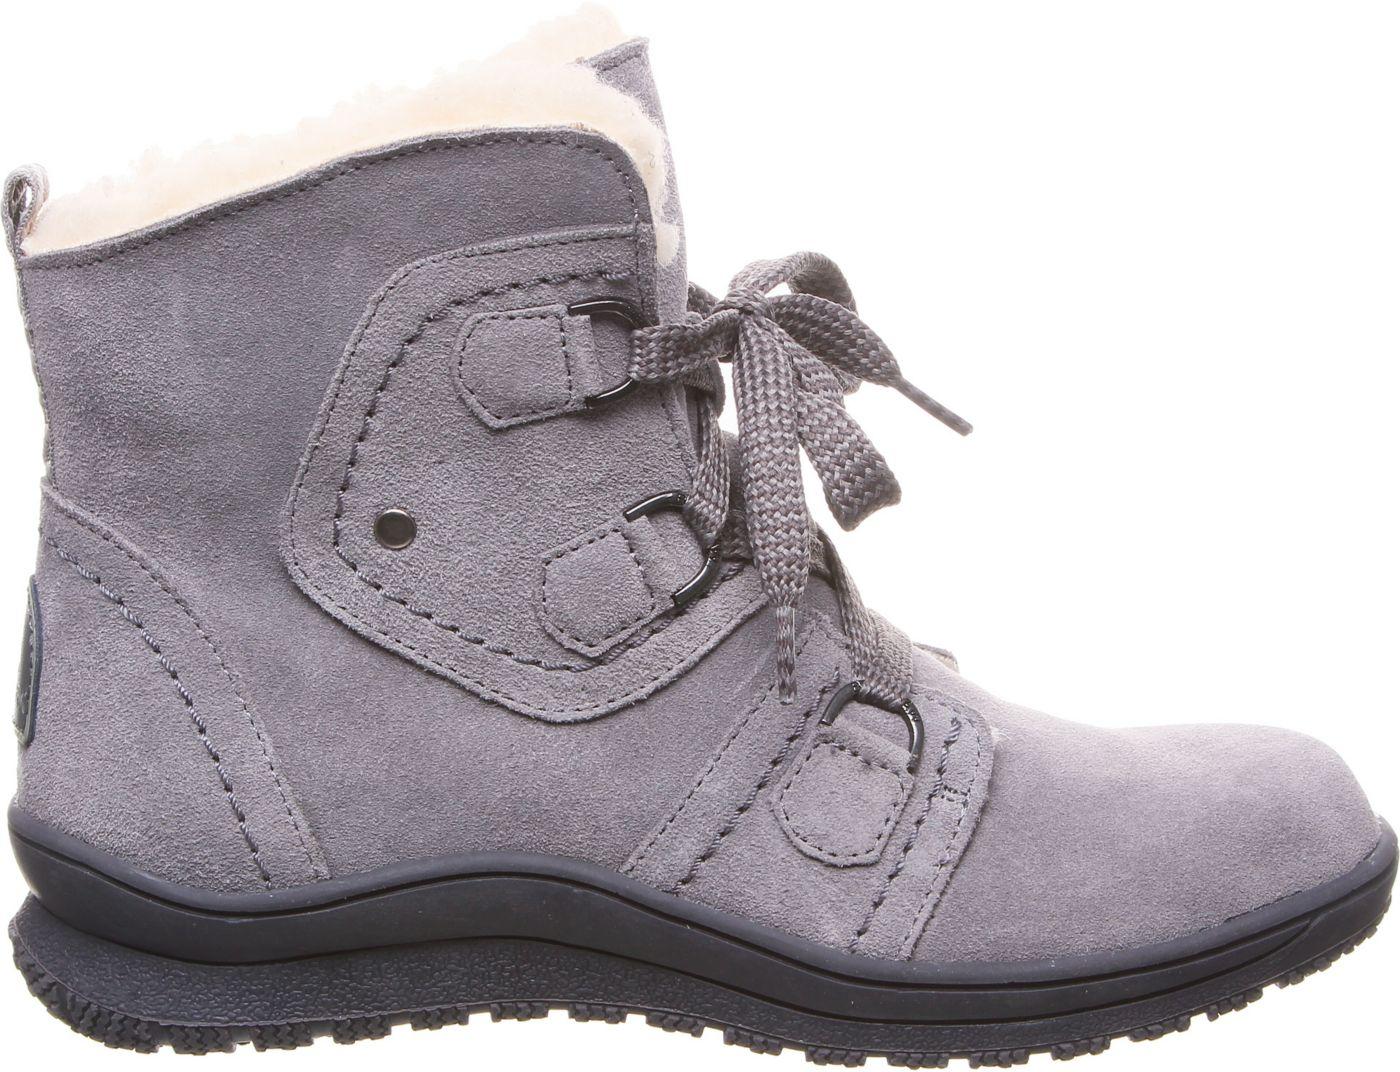 BEARPAW Women's Justine Winter Boots